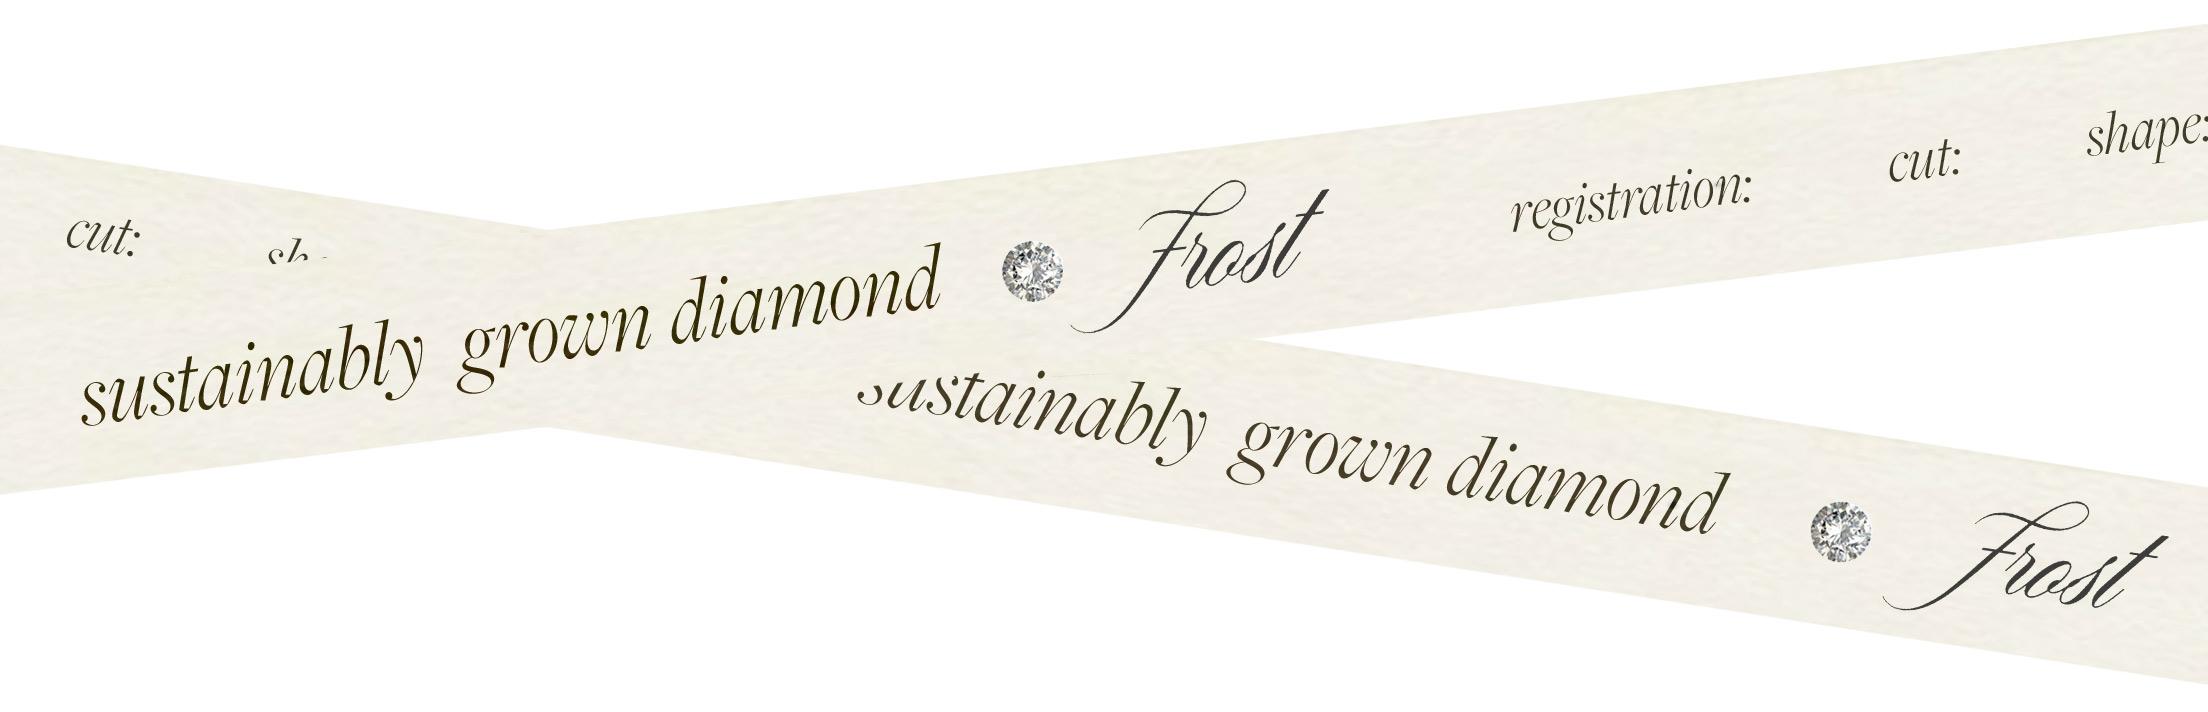 Sustainably Grown Diamond - Frost